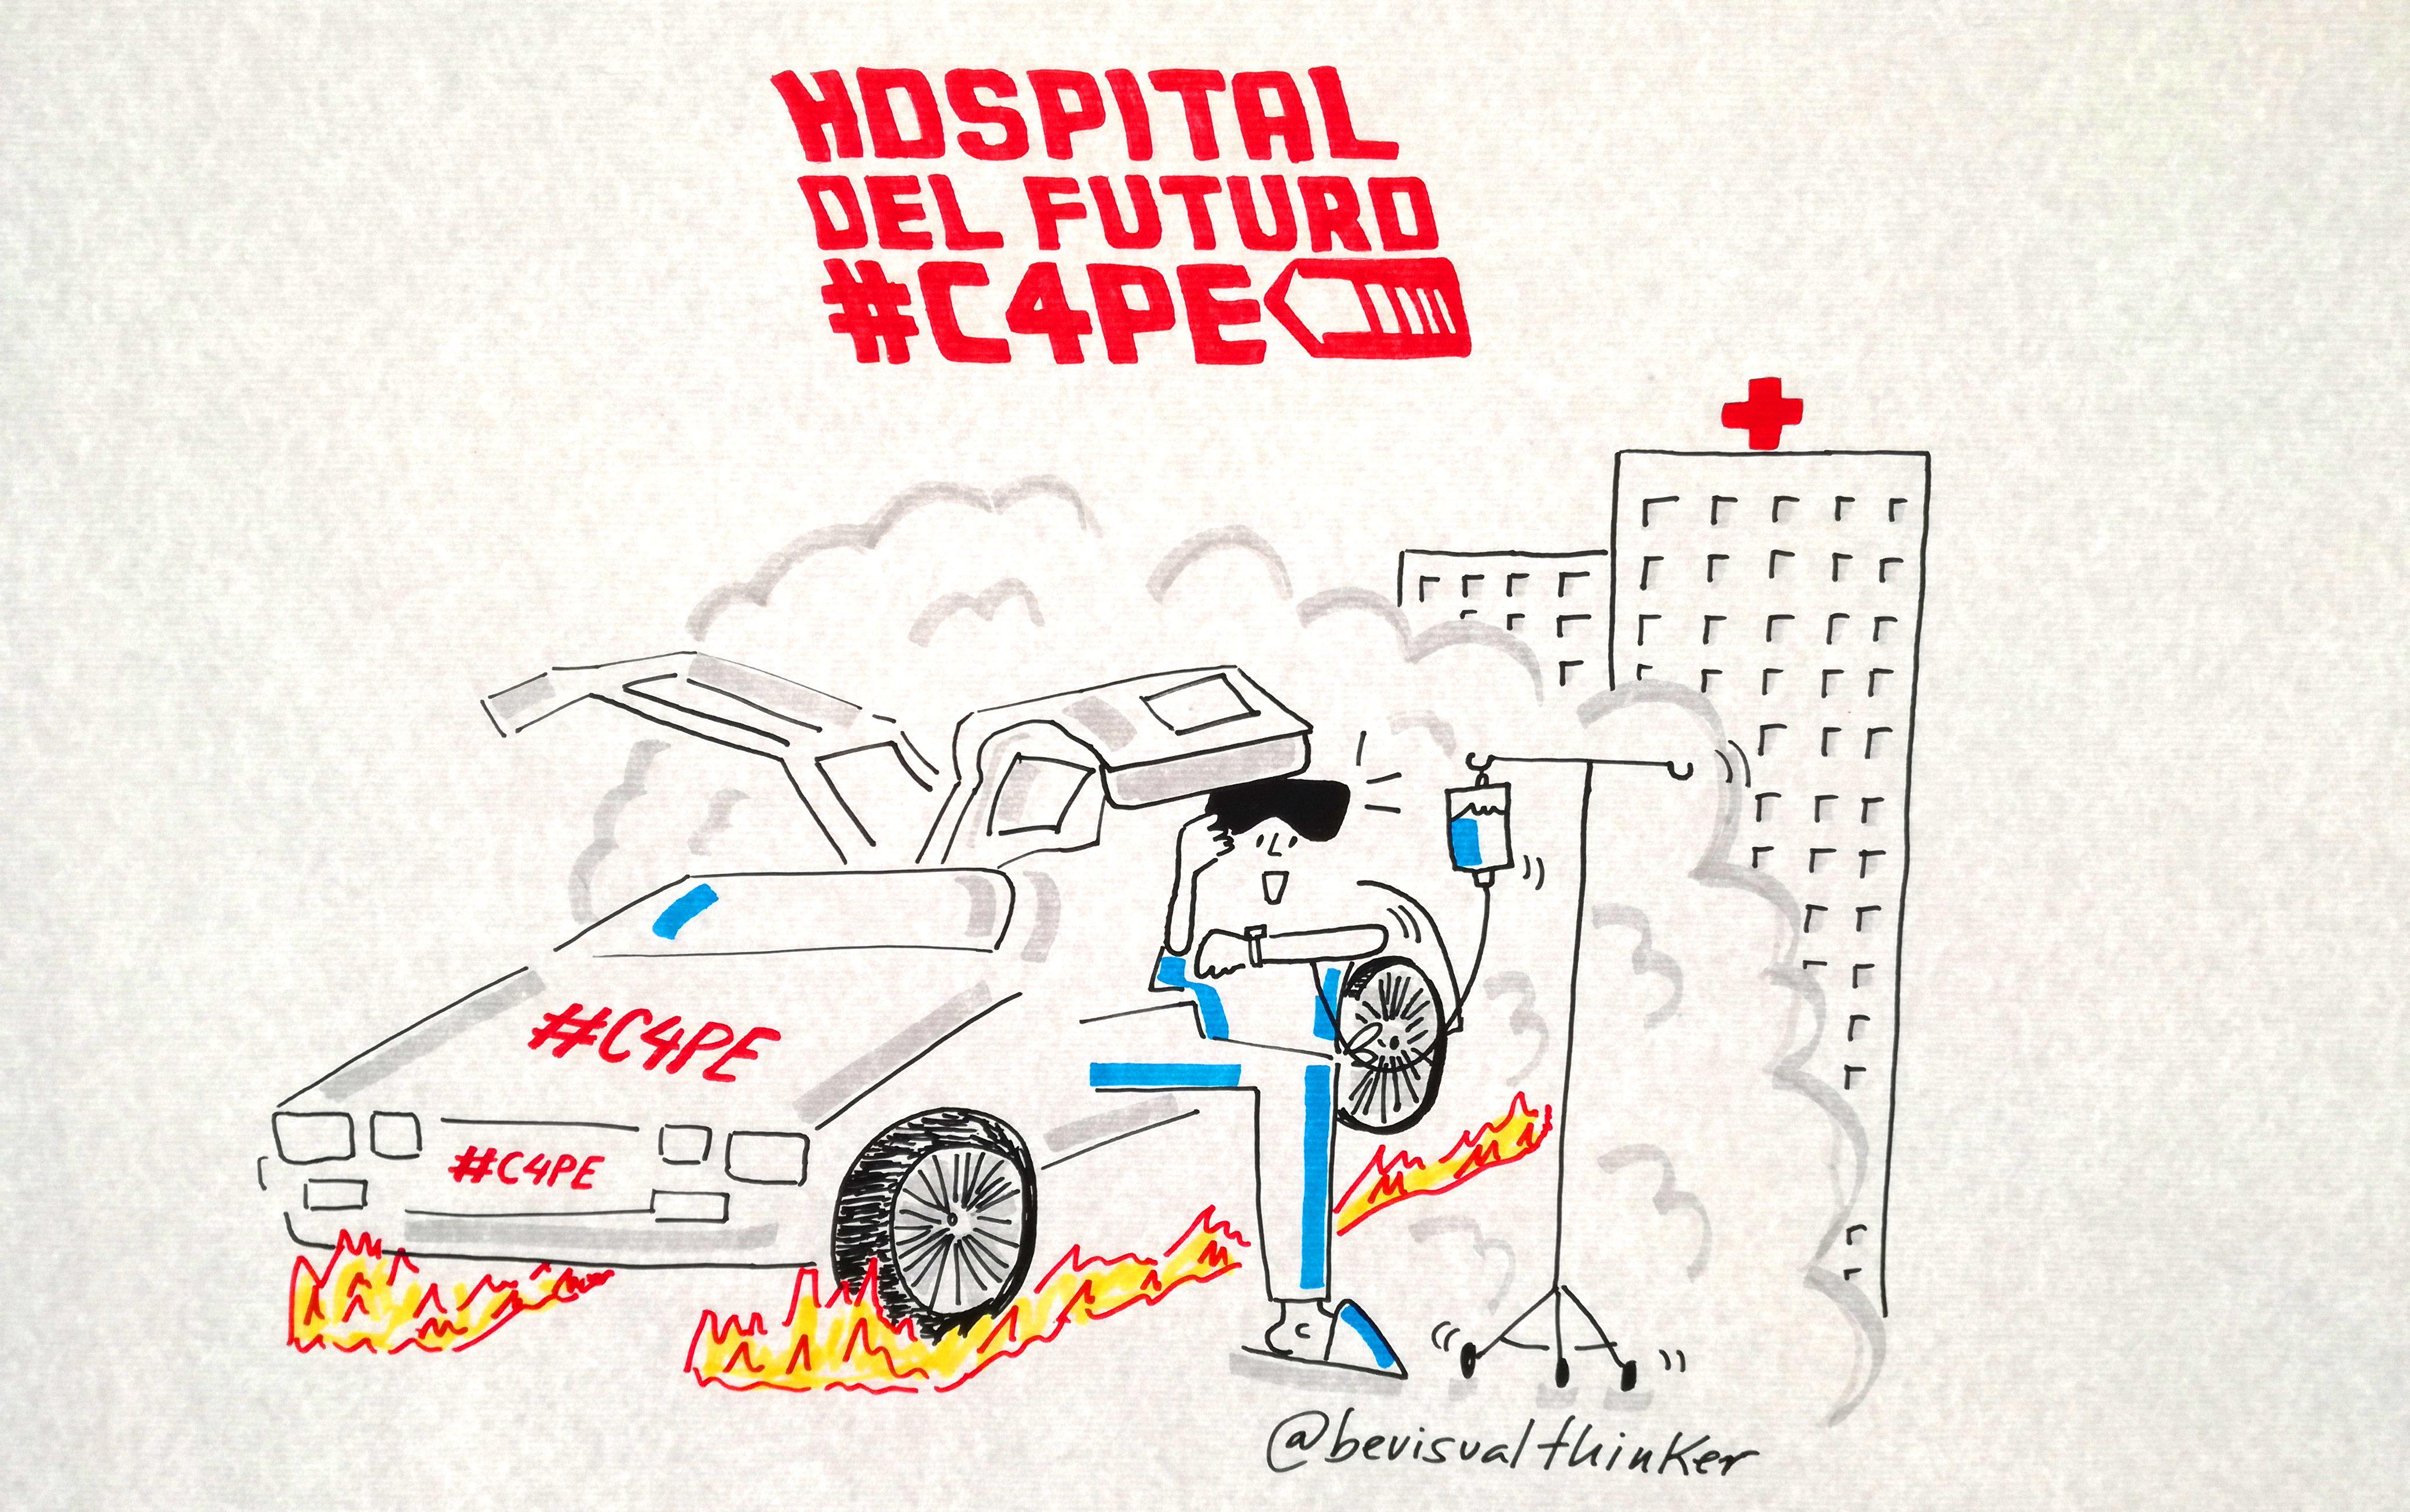 Regreso al hospital del futuro